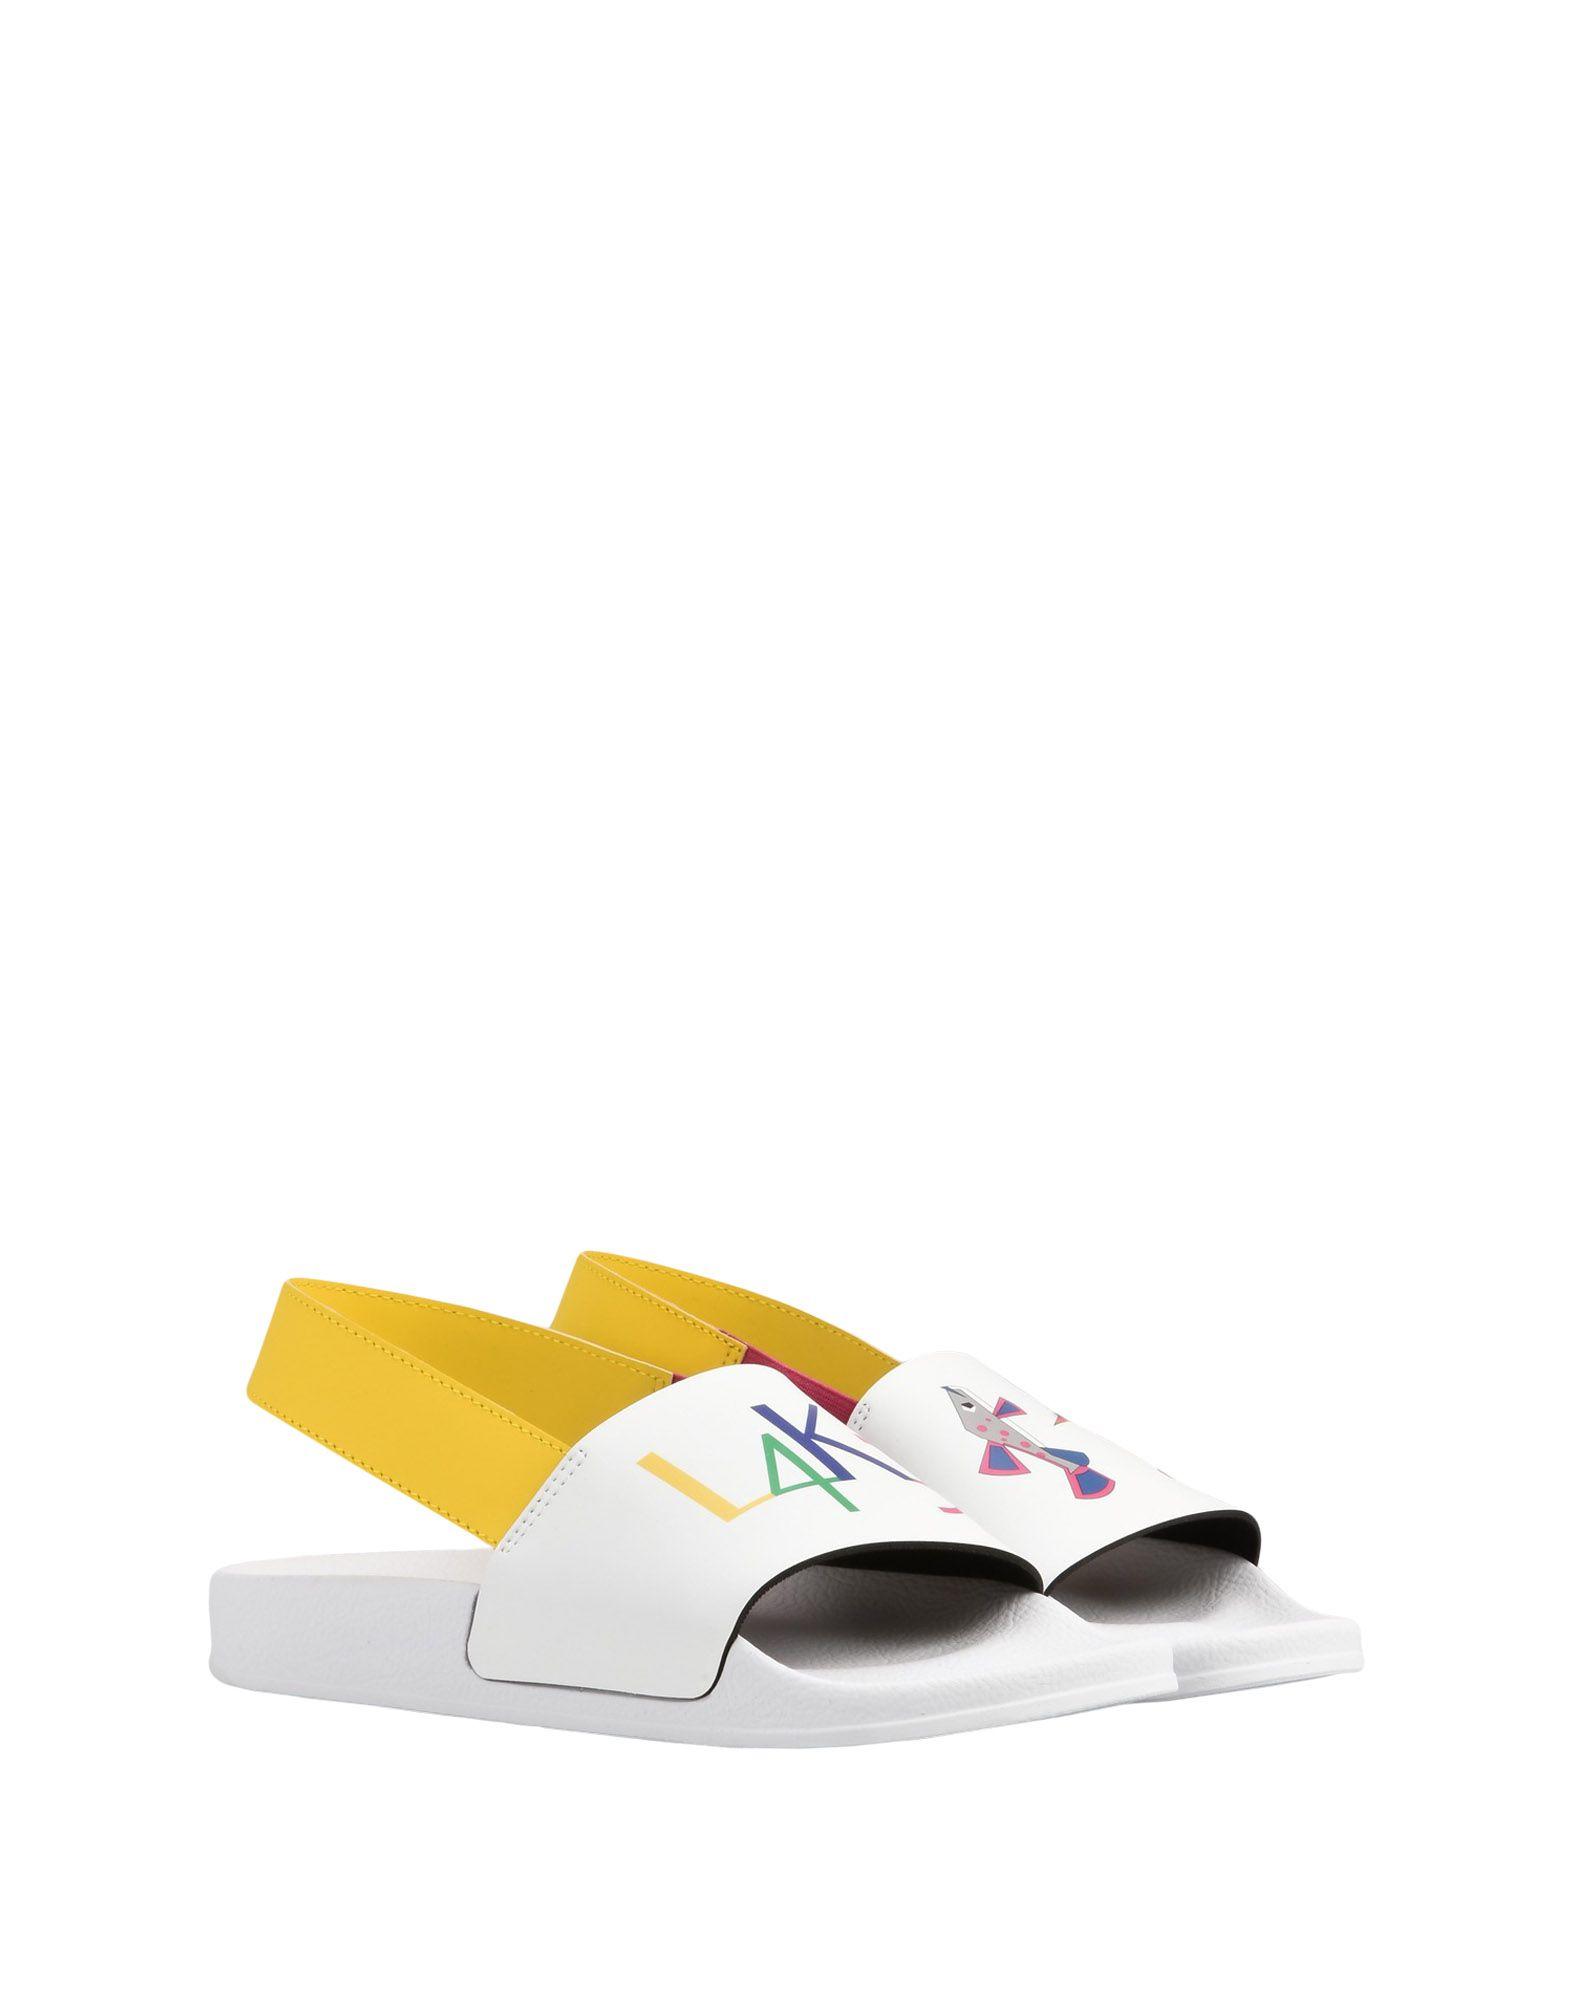 Sandales L4k3 Sandalo - Femme - Sandales L4k3 sur